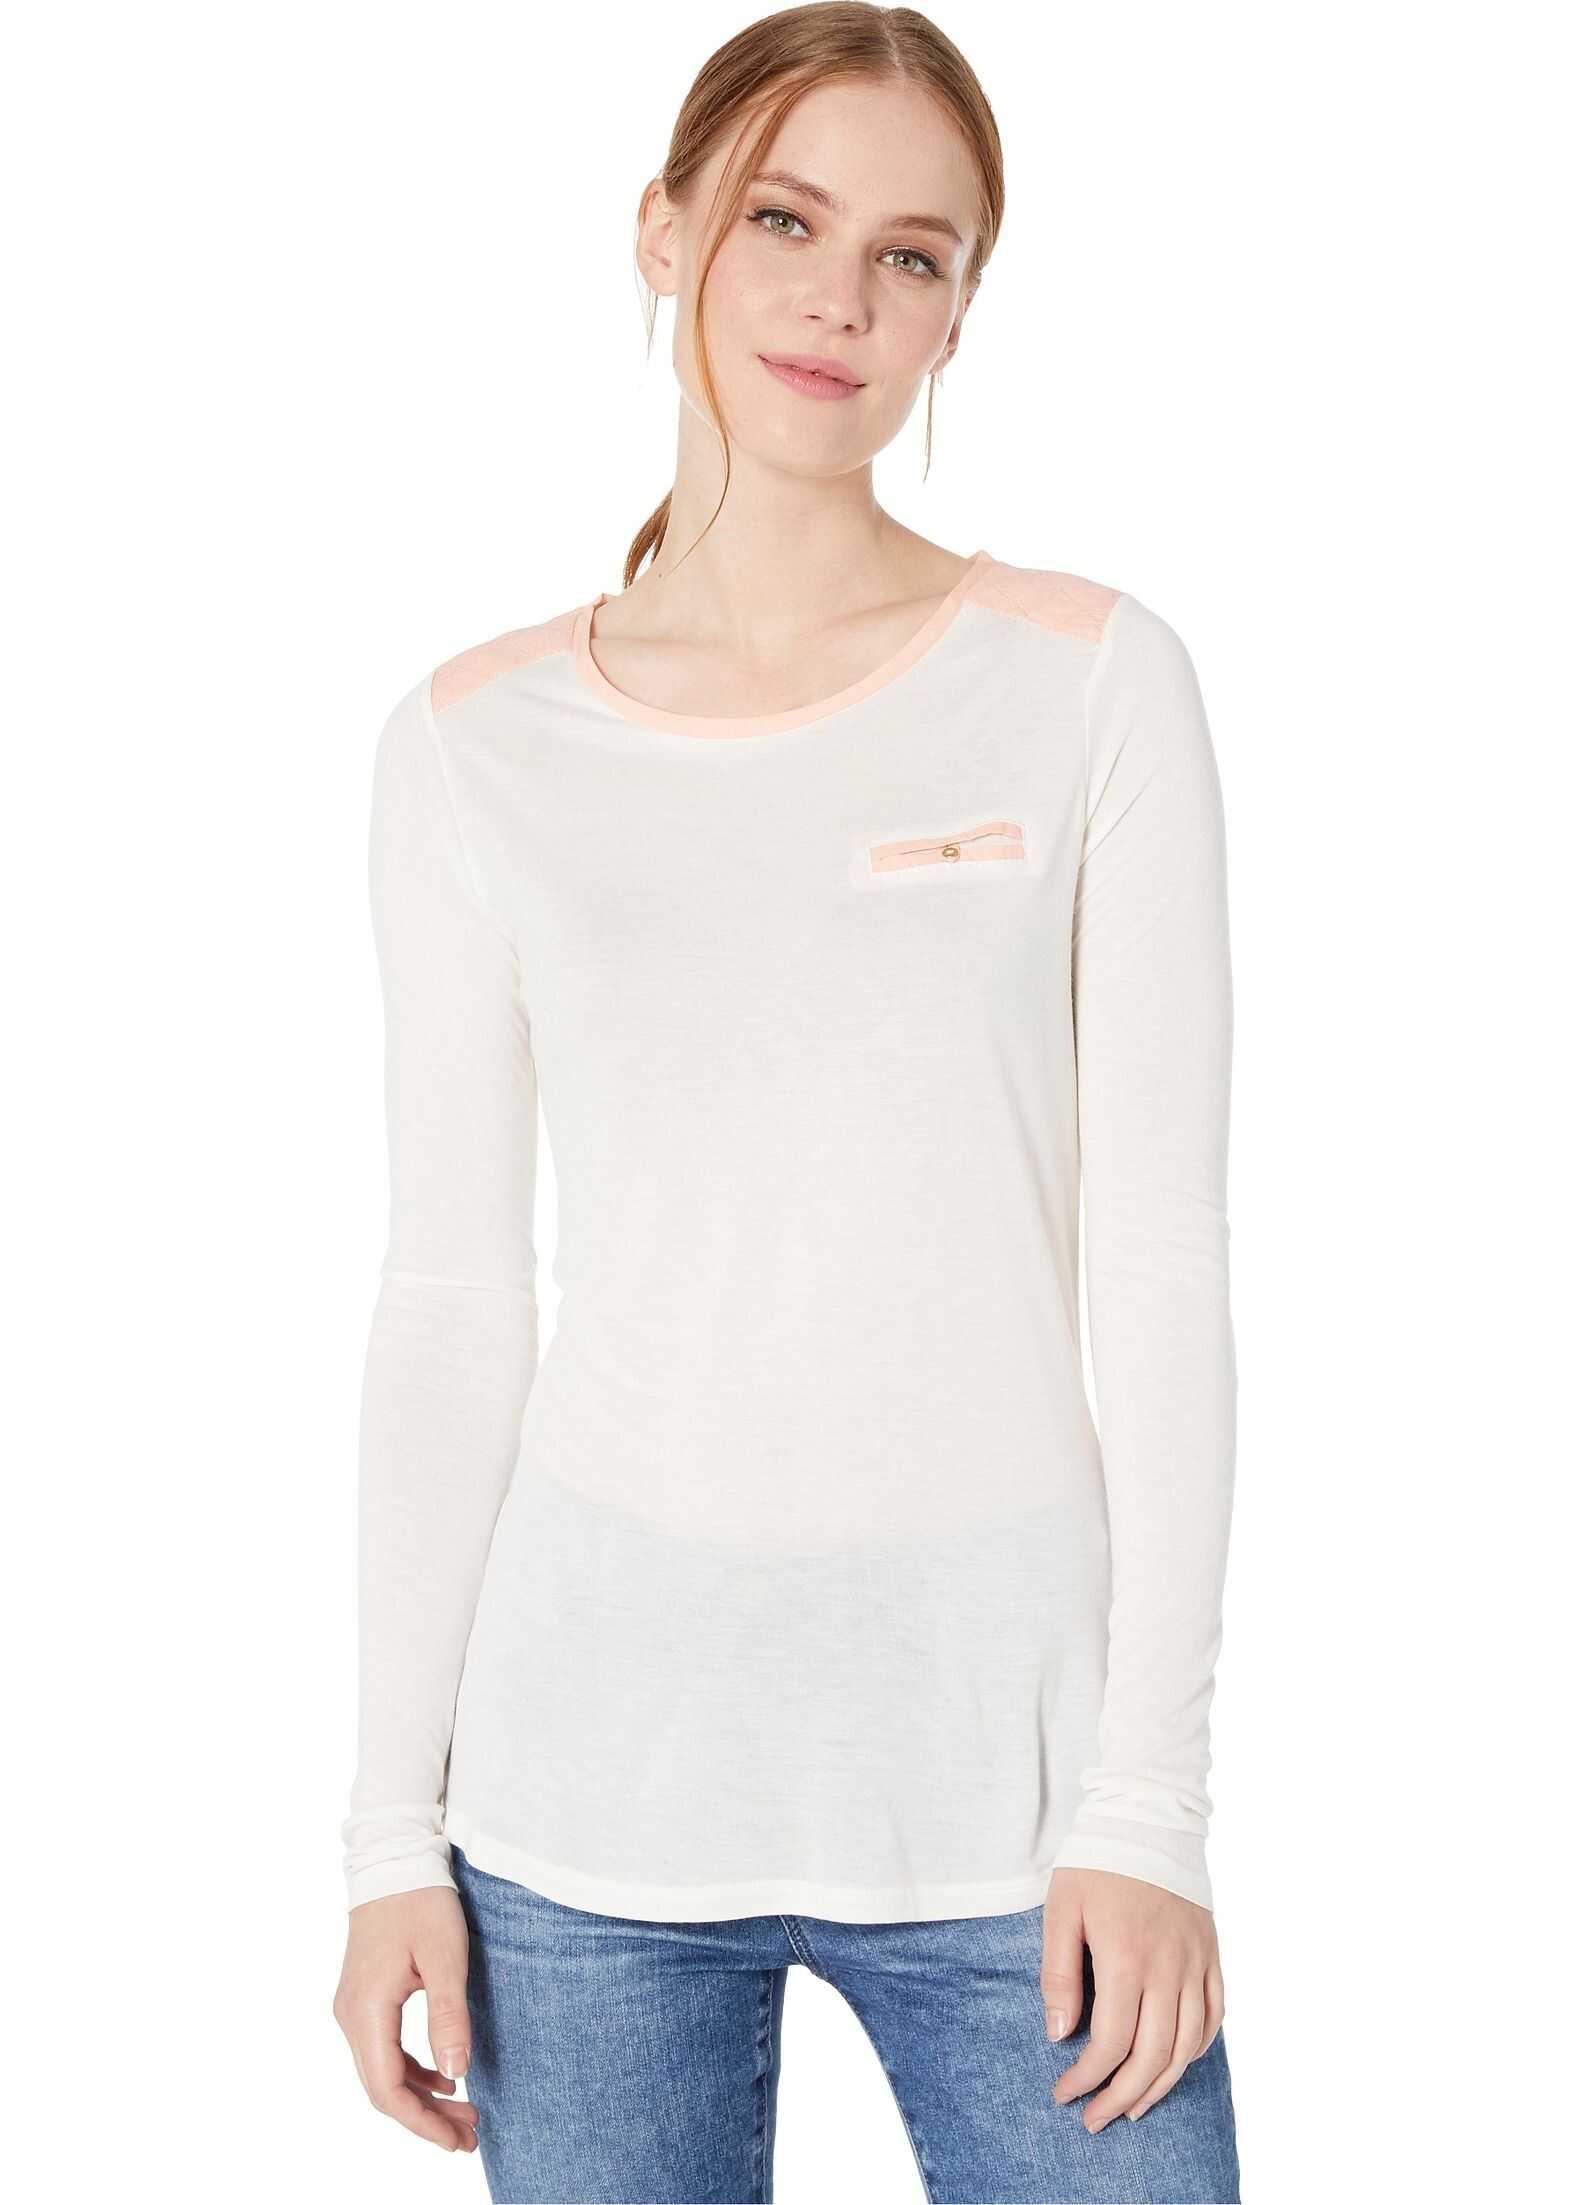 U.S. POLO ASSN. Long Sleeve Pocket T-Shirt Marshmallow